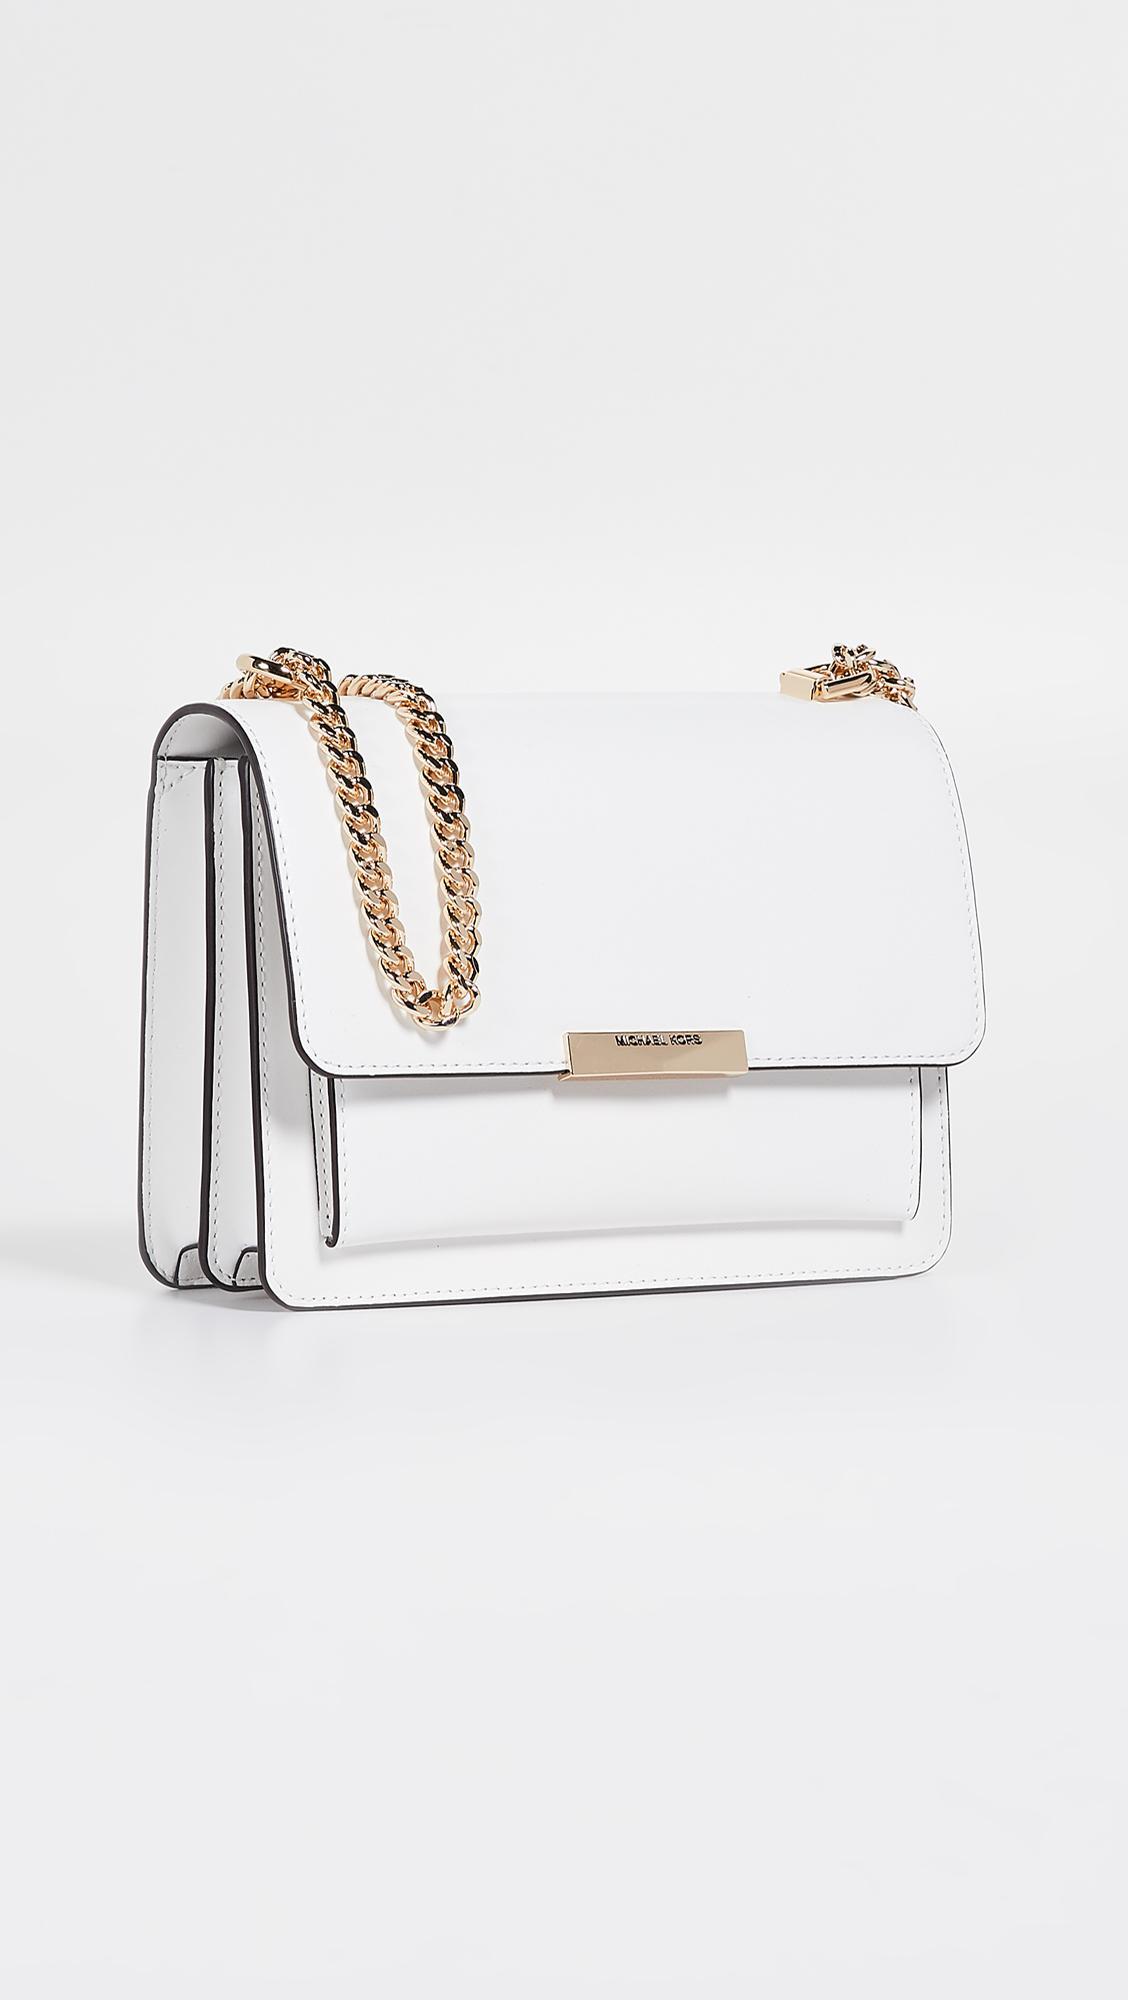 879ea07fe724 Lyst - MICHAEL Michael Kors Jade Large Gusset Shoulder Bag in White